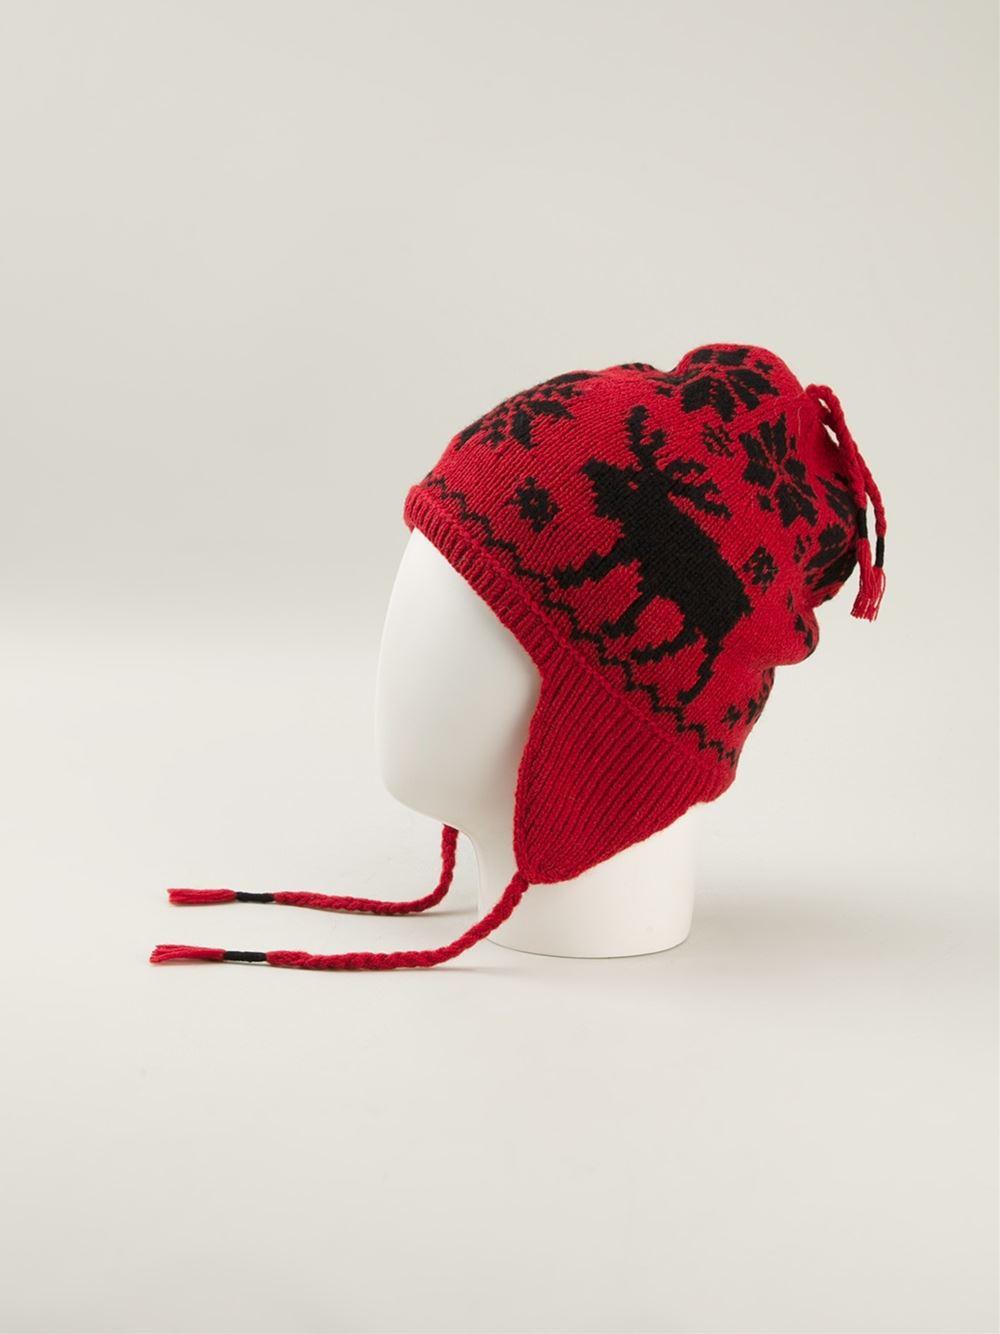 bb5220b06 Polo Ralph Lauren Ear Flap Beanie in Red for Men - Lyst